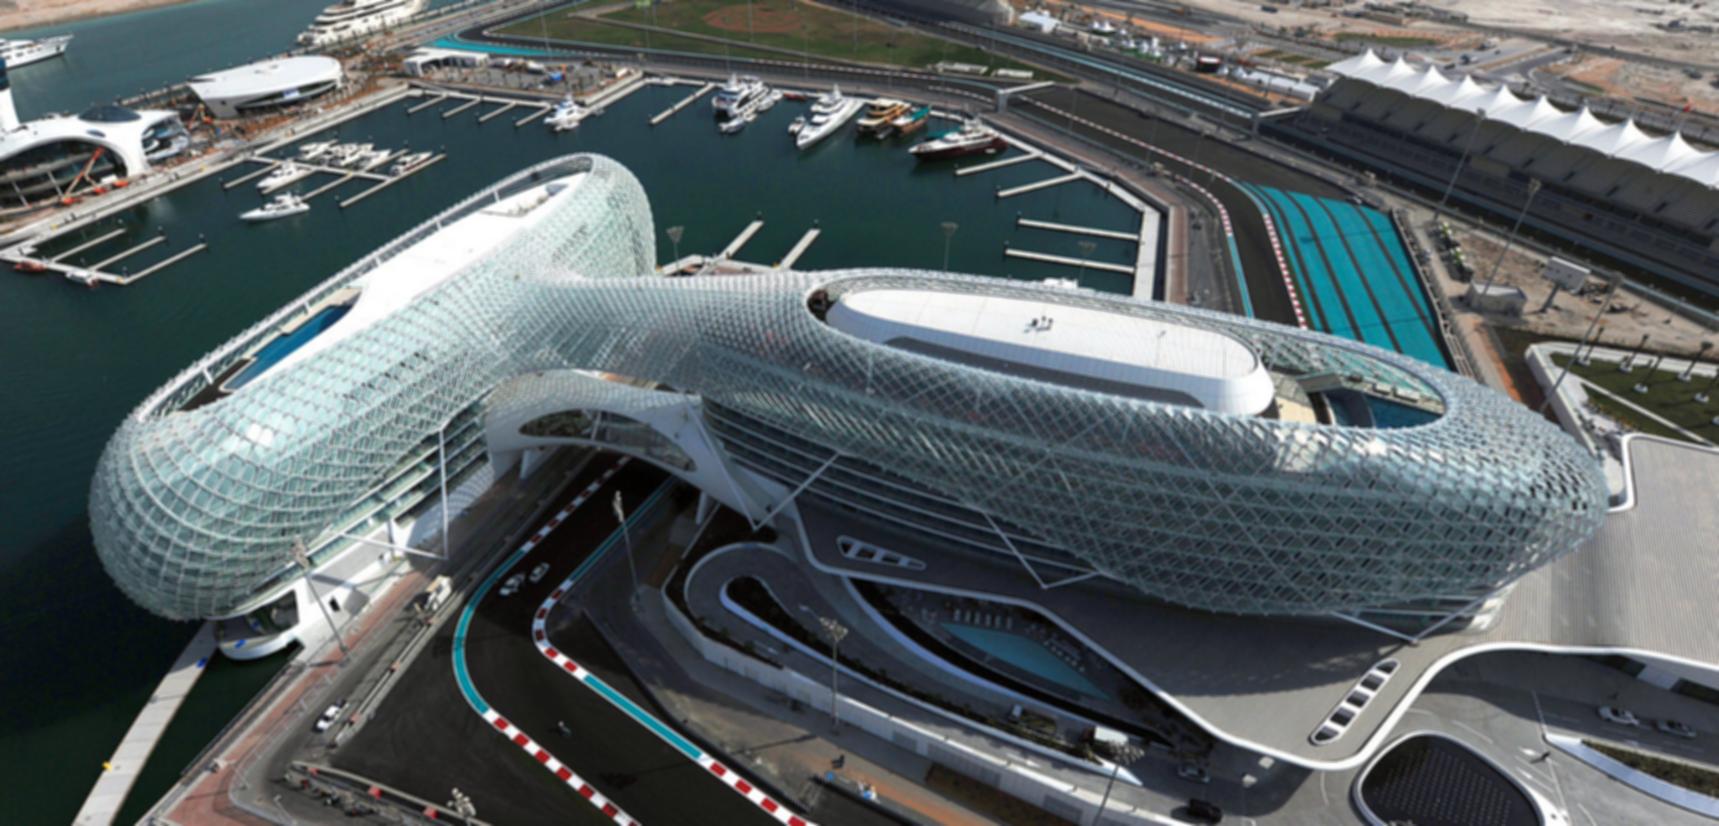 Yas Viceroy Abu Dhabi - Bird's Eye View